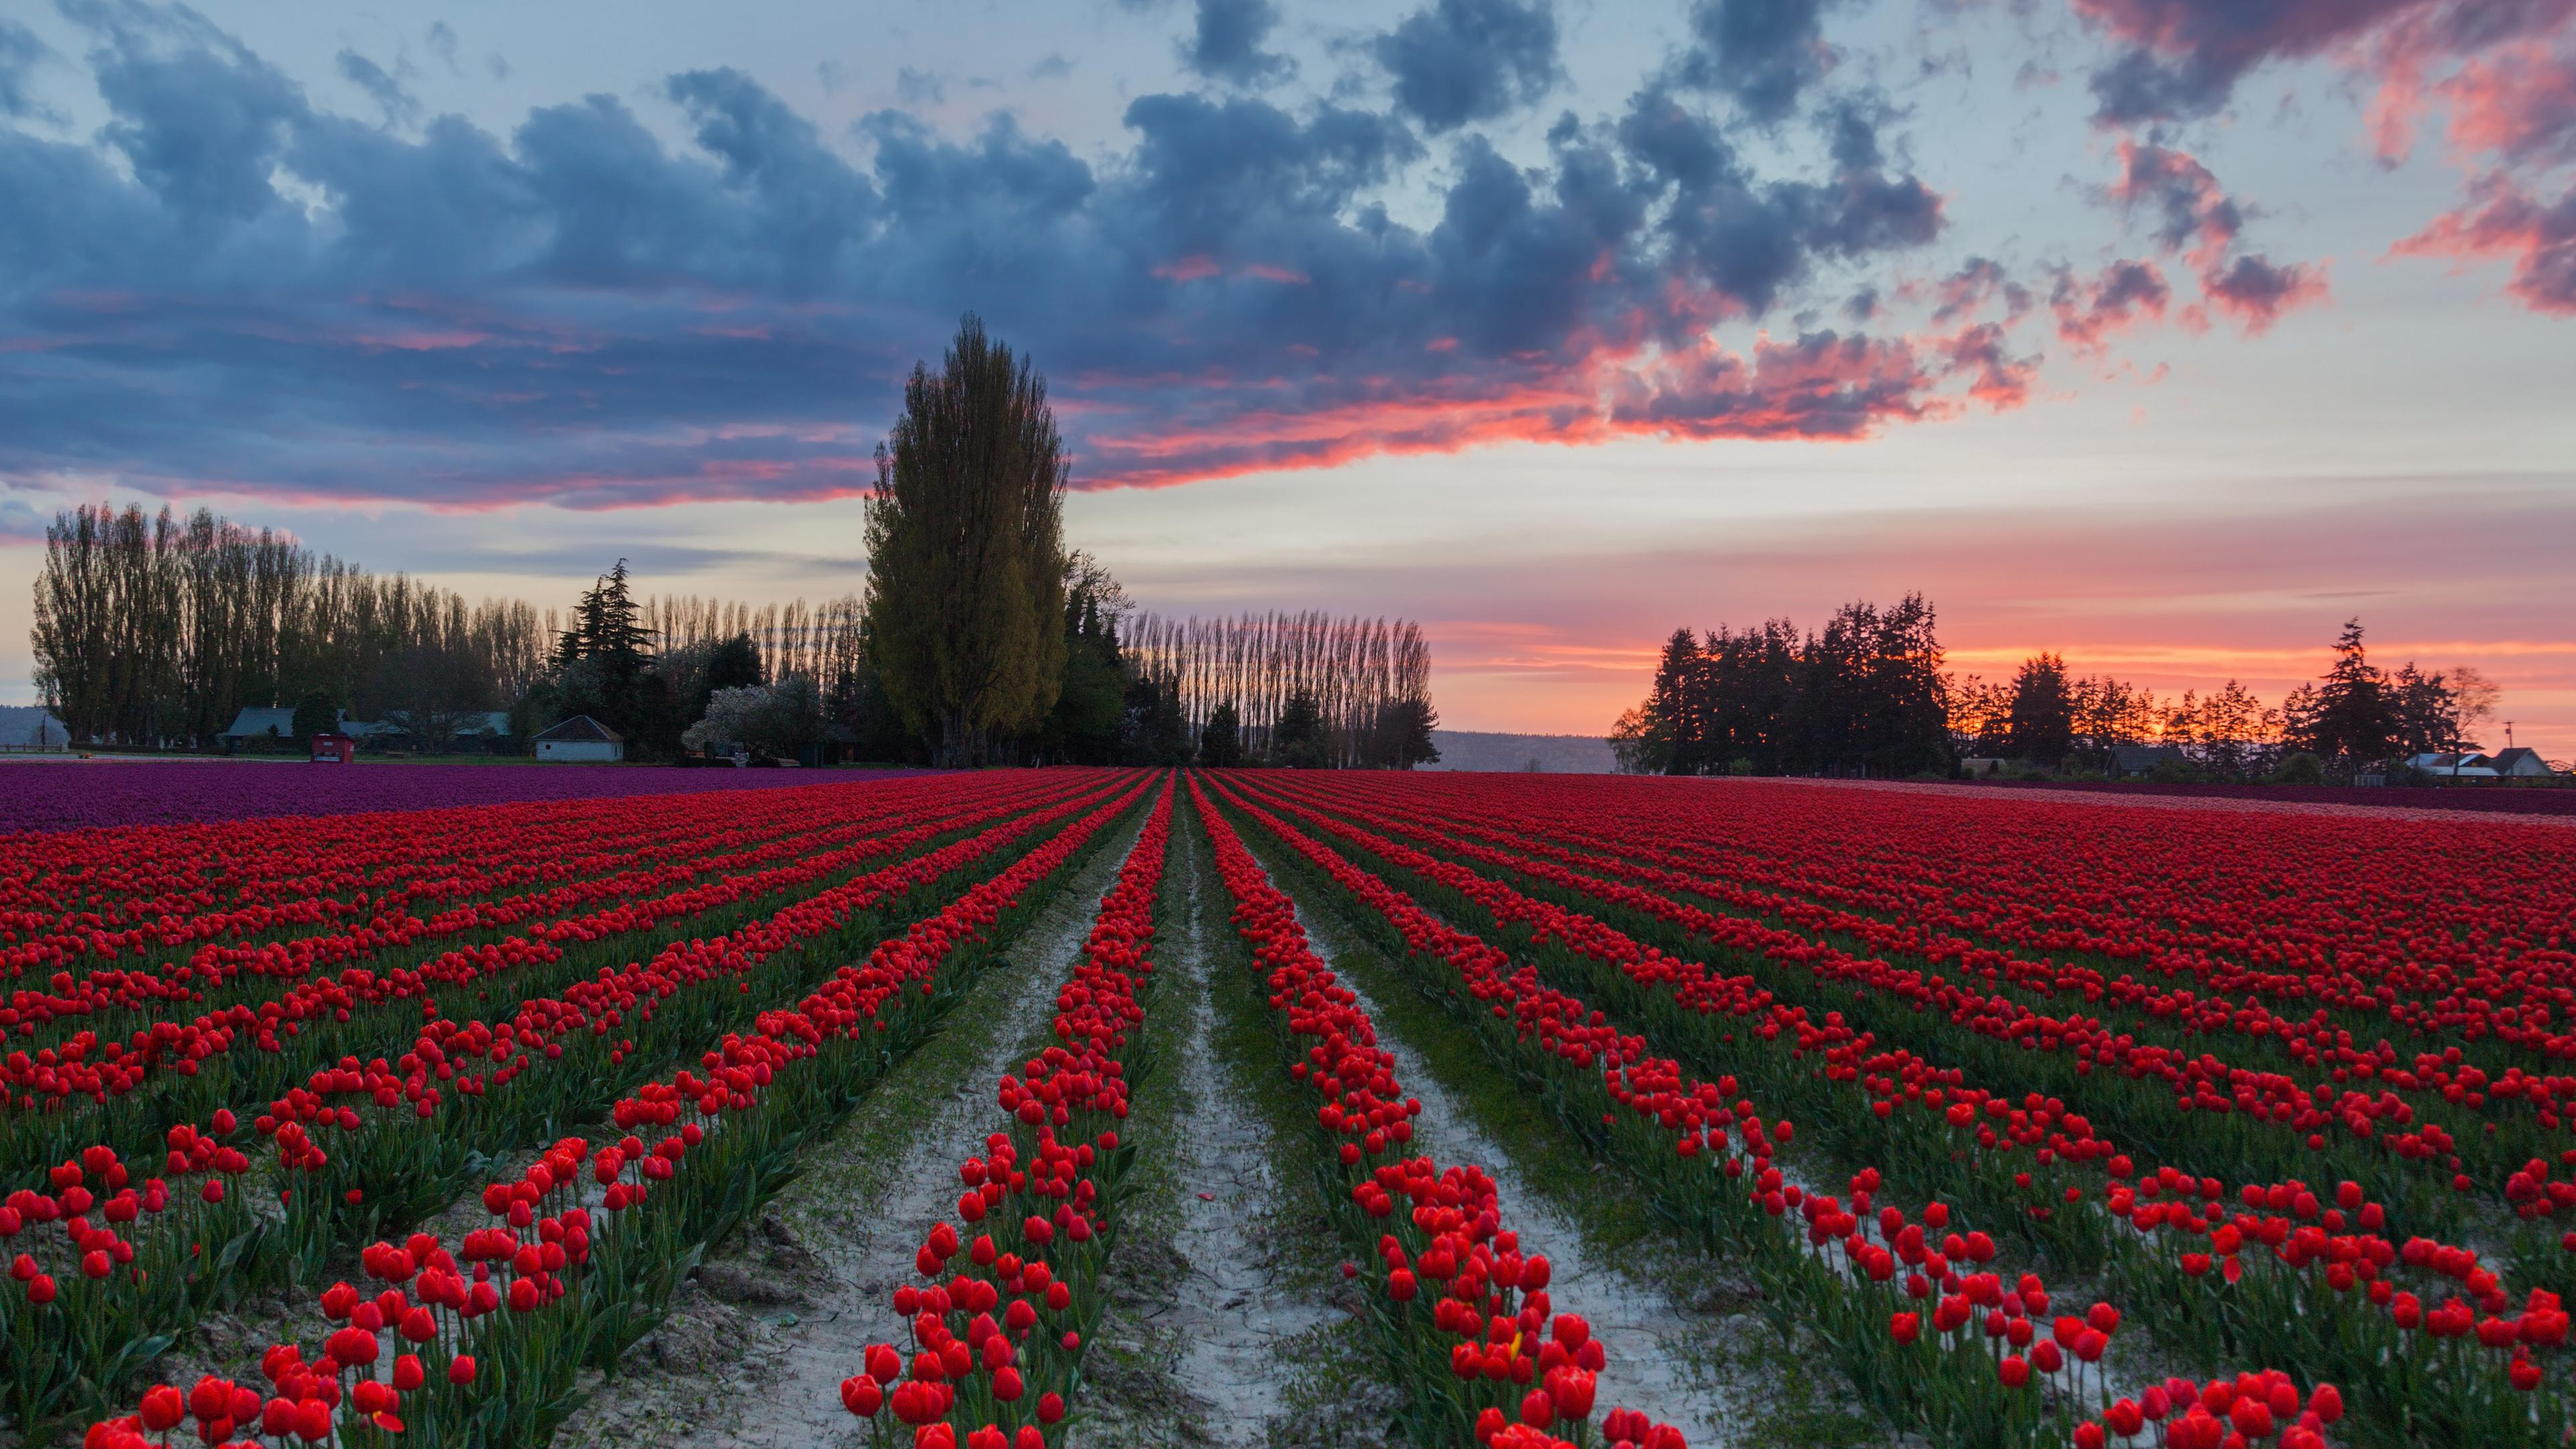 BOTPOST] Sunset in the Tulip Fields Skagit Valley WA [3840x2160 3840x2160